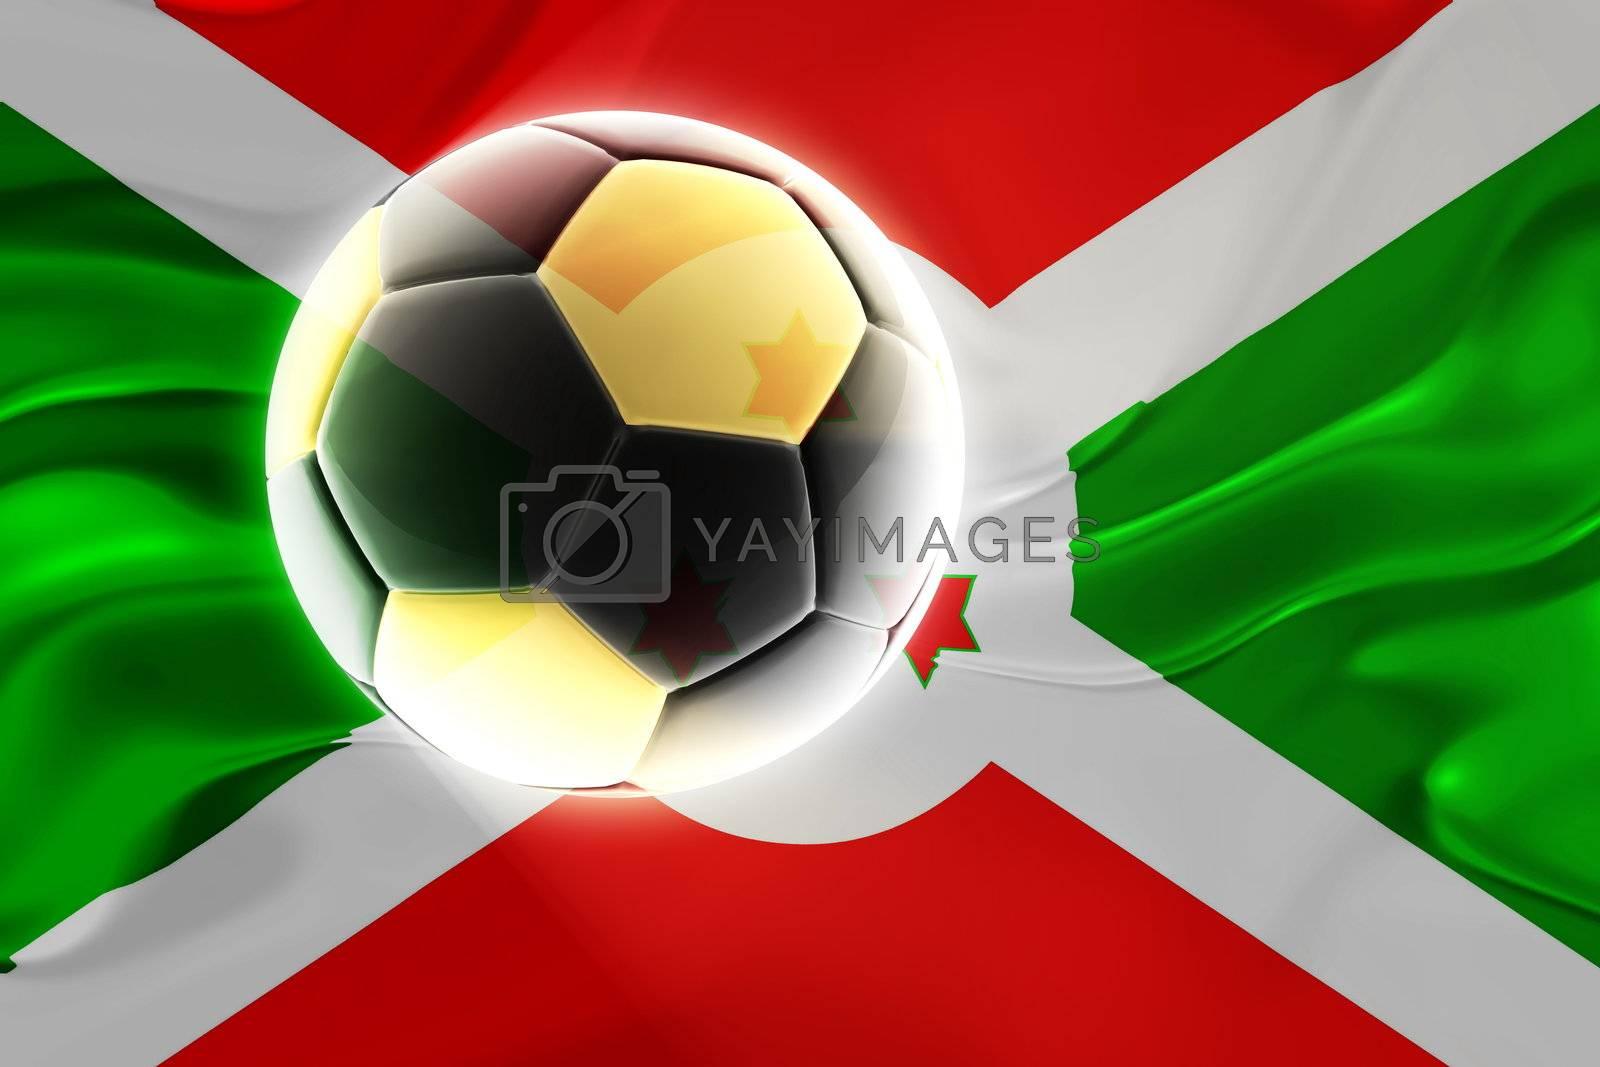 Flag of Burundi wavy soccer by kgtoh